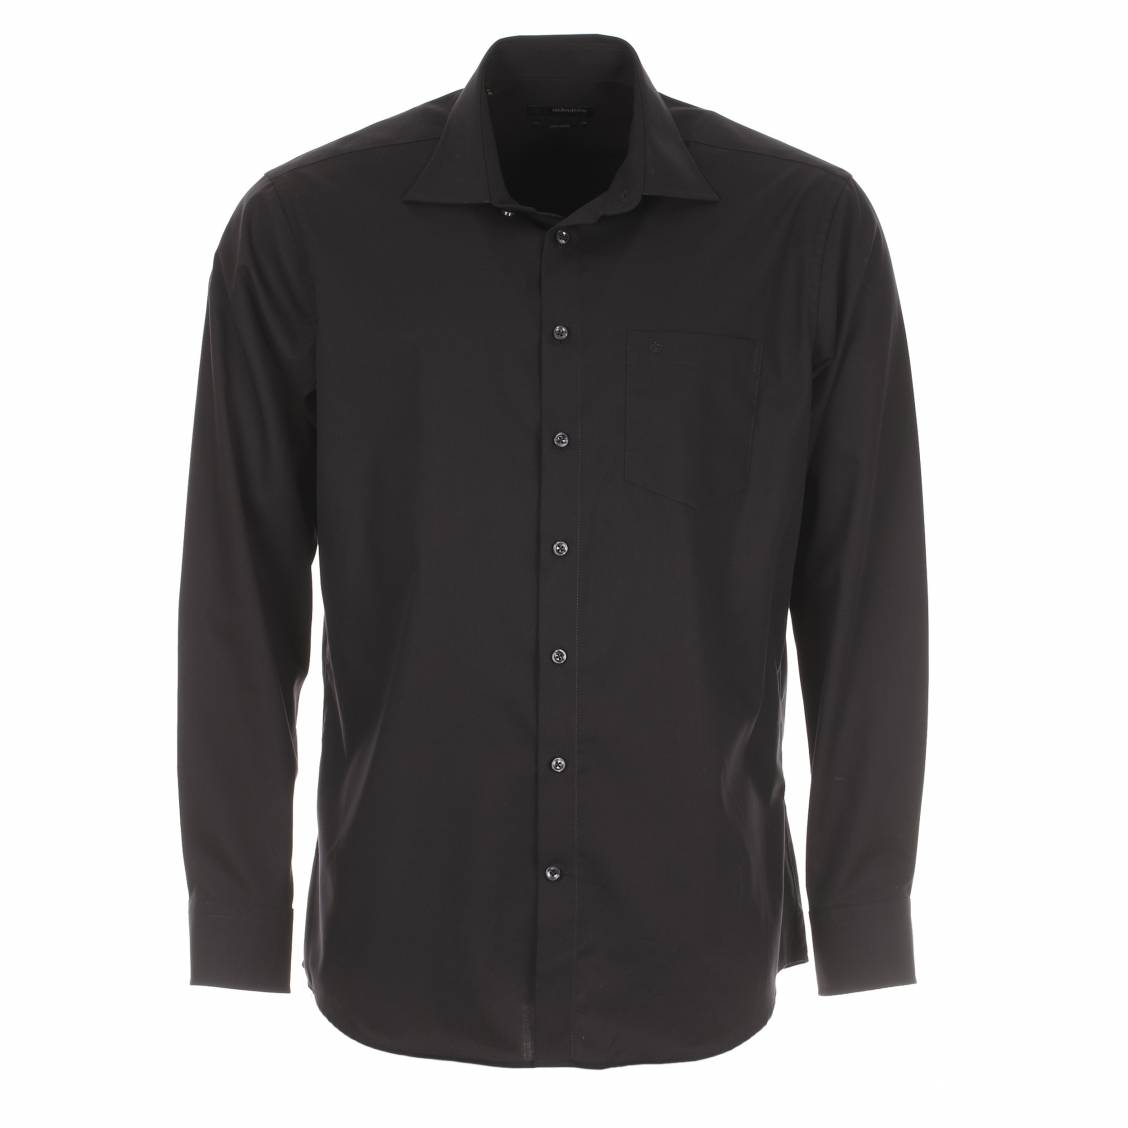 chemise droite seidensticker spendesto sans repassage noire rue des hommes. Black Bedroom Furniture Sets. Home Design Ideas